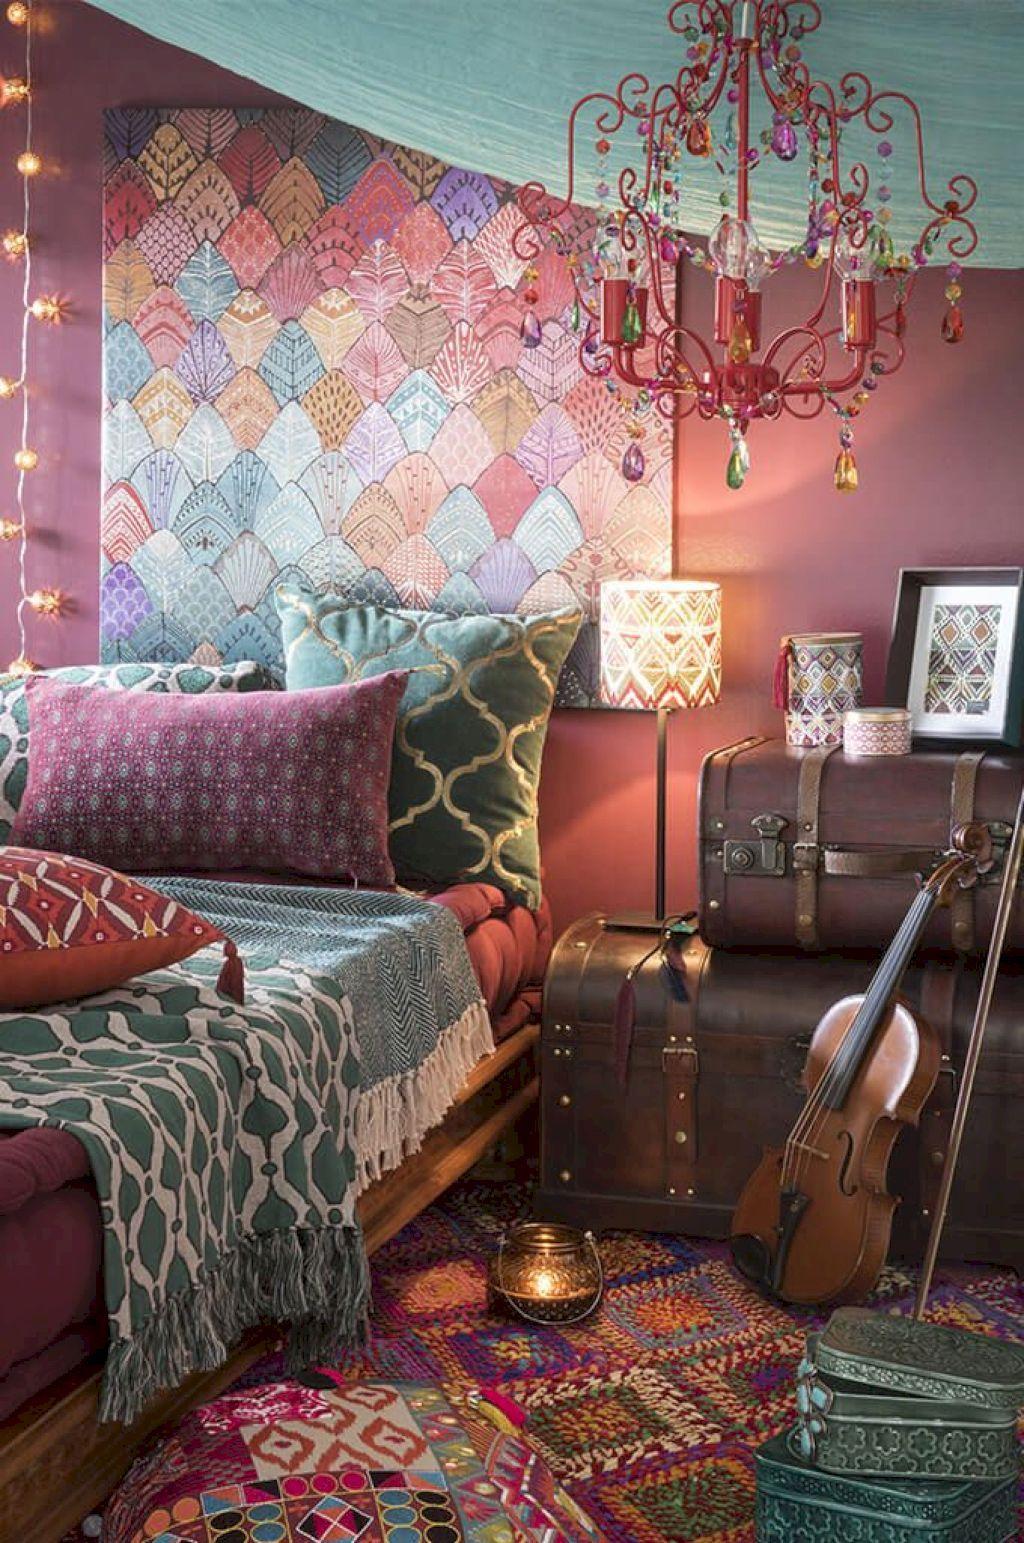 22 Inspiring DIY Boho Chic Decor Ideas on a Budget in 2020 ... on Boho Bedroom Ideas On A Budget  id=75549